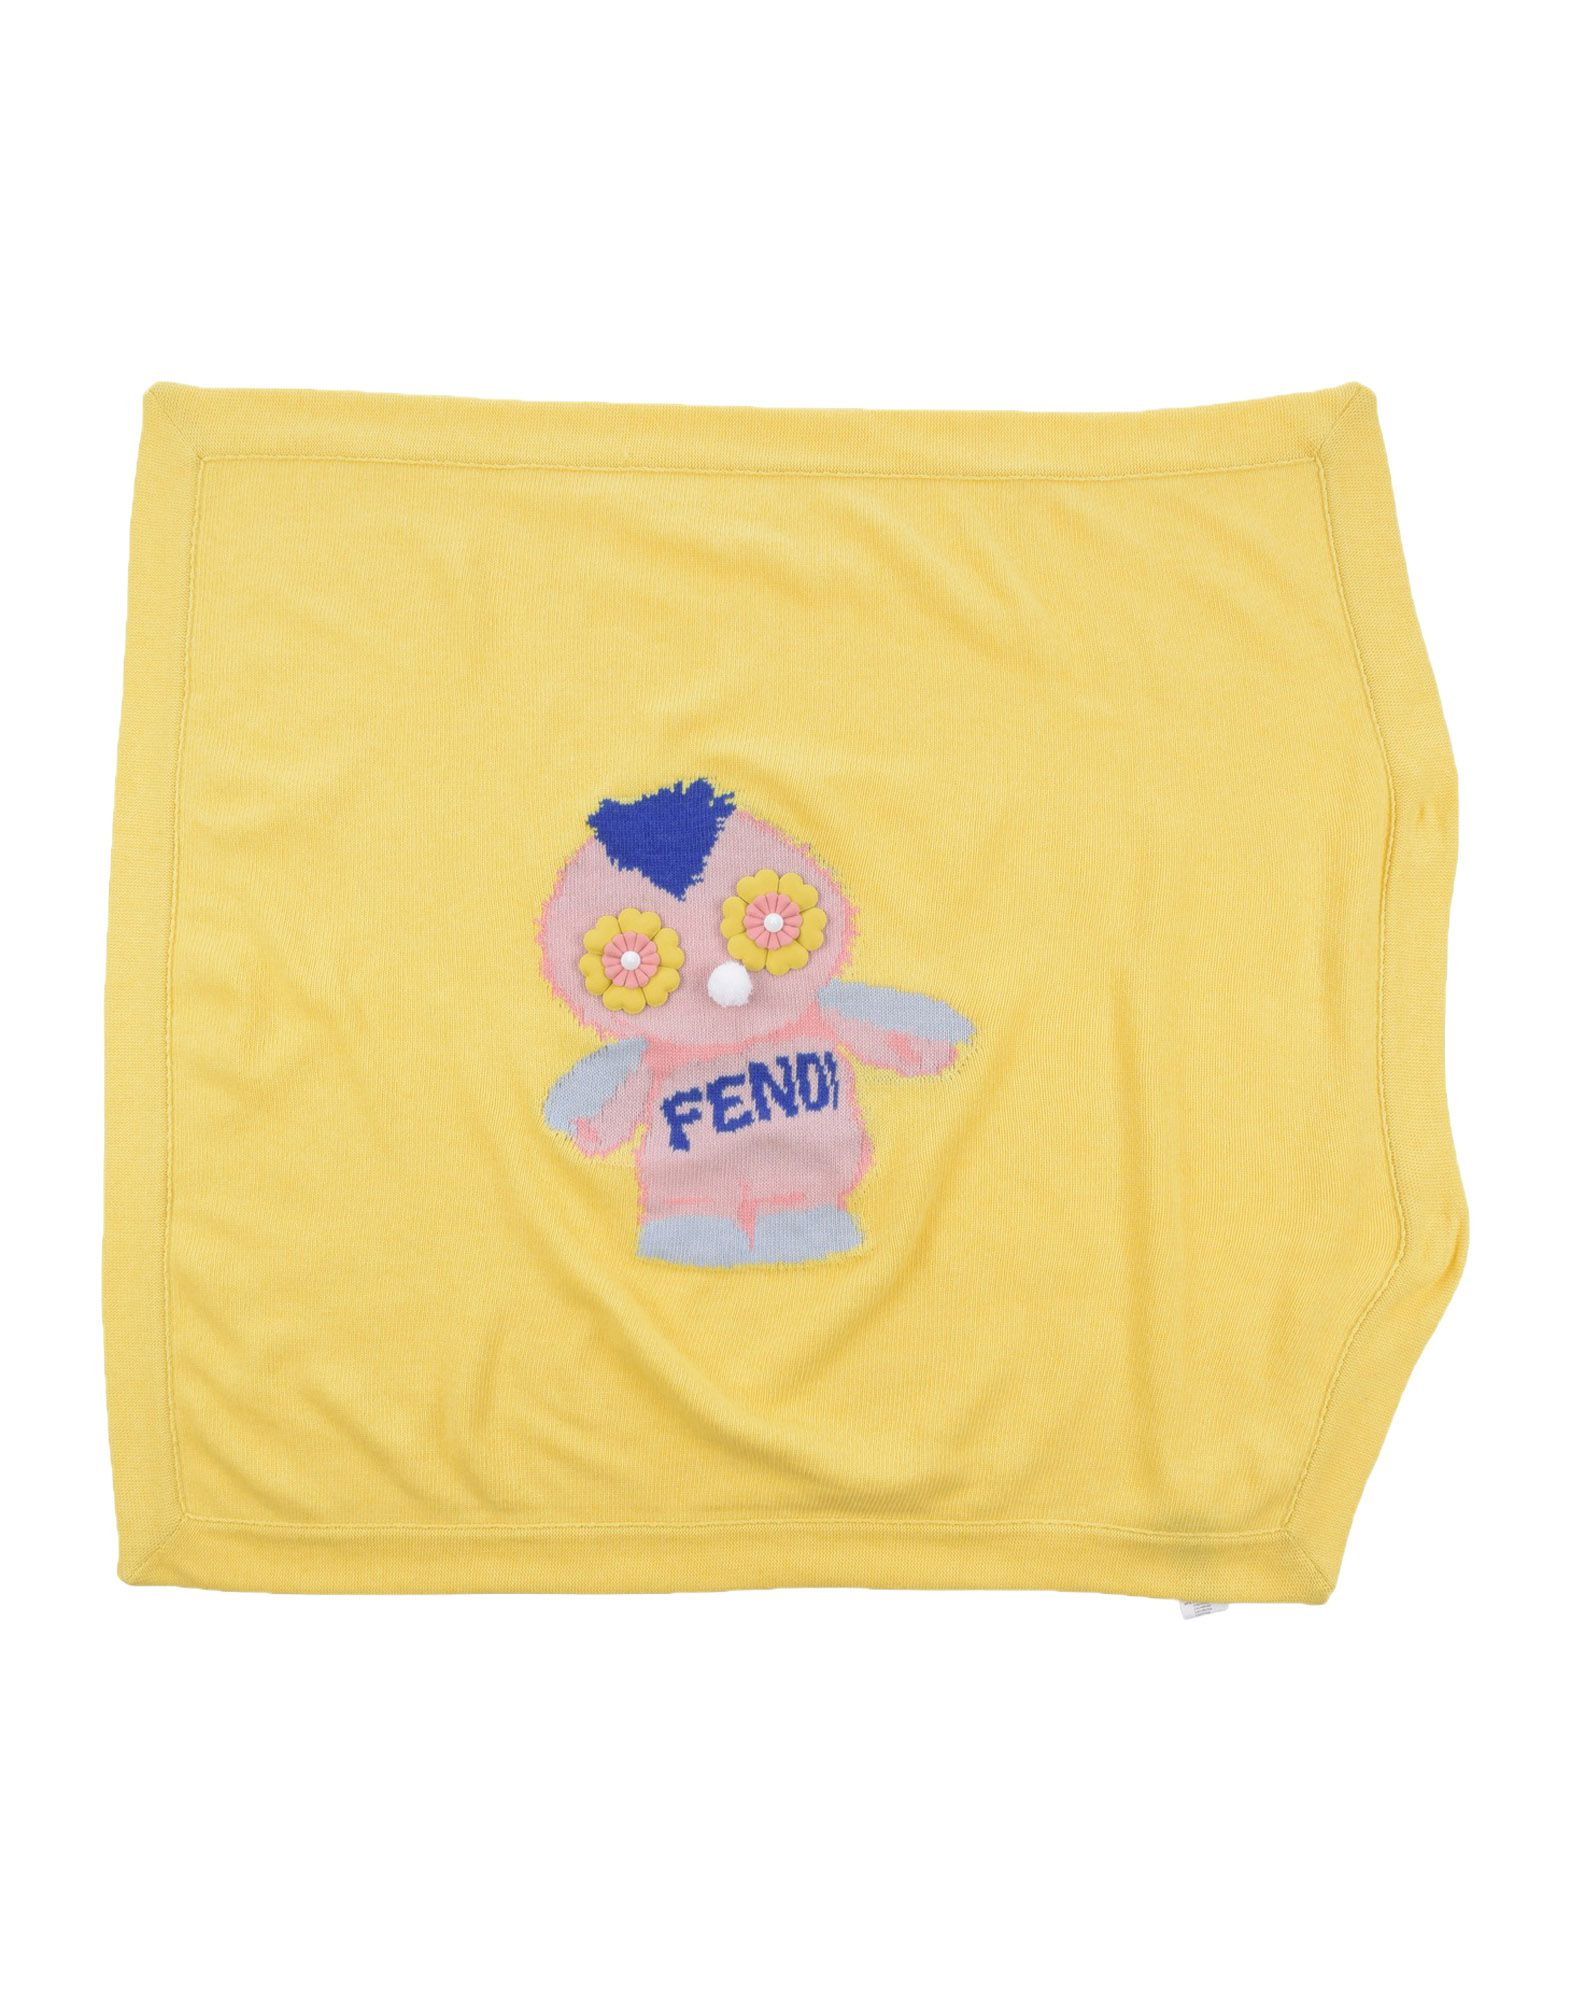 FENDI   FENDI Baby Blankets 58043381   Goxip